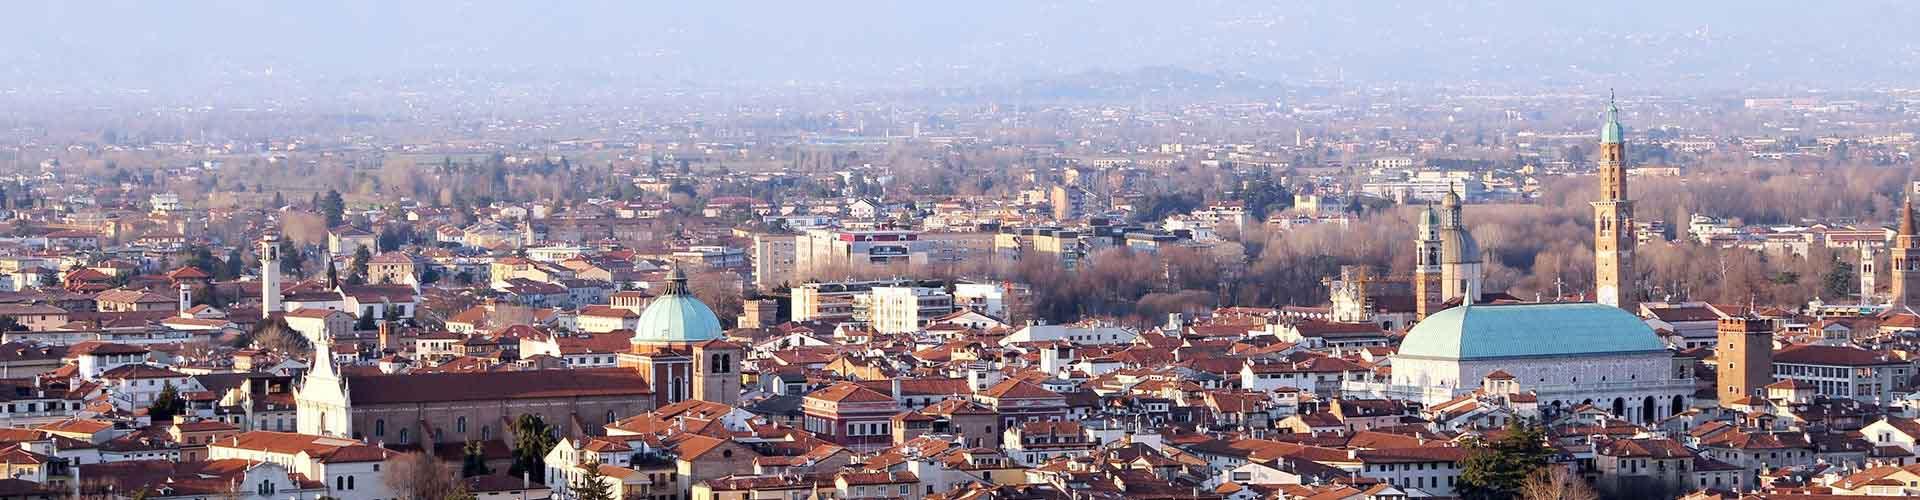 Vicenza - Hoteles baratos en Vicenza. Mapas de Vicenza, Fotos y comentarios de cada Hotel en Vicenza.